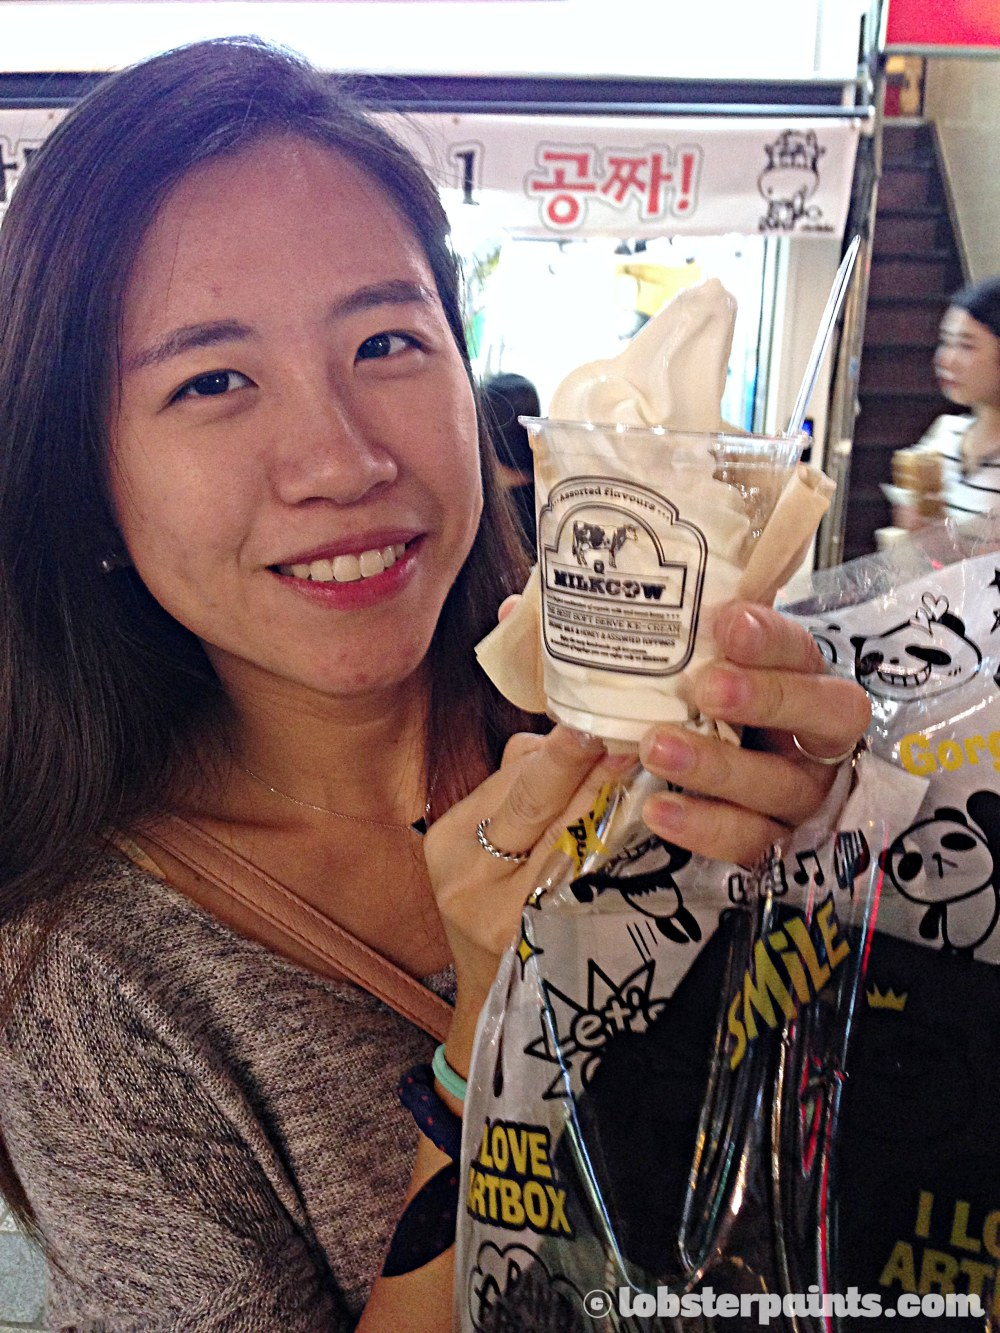 27 Sep 2014: Soft serve ice cream with Honey from Milkcow at Gwangbok-ro Culture & Fashion Street | Busan, South Korea